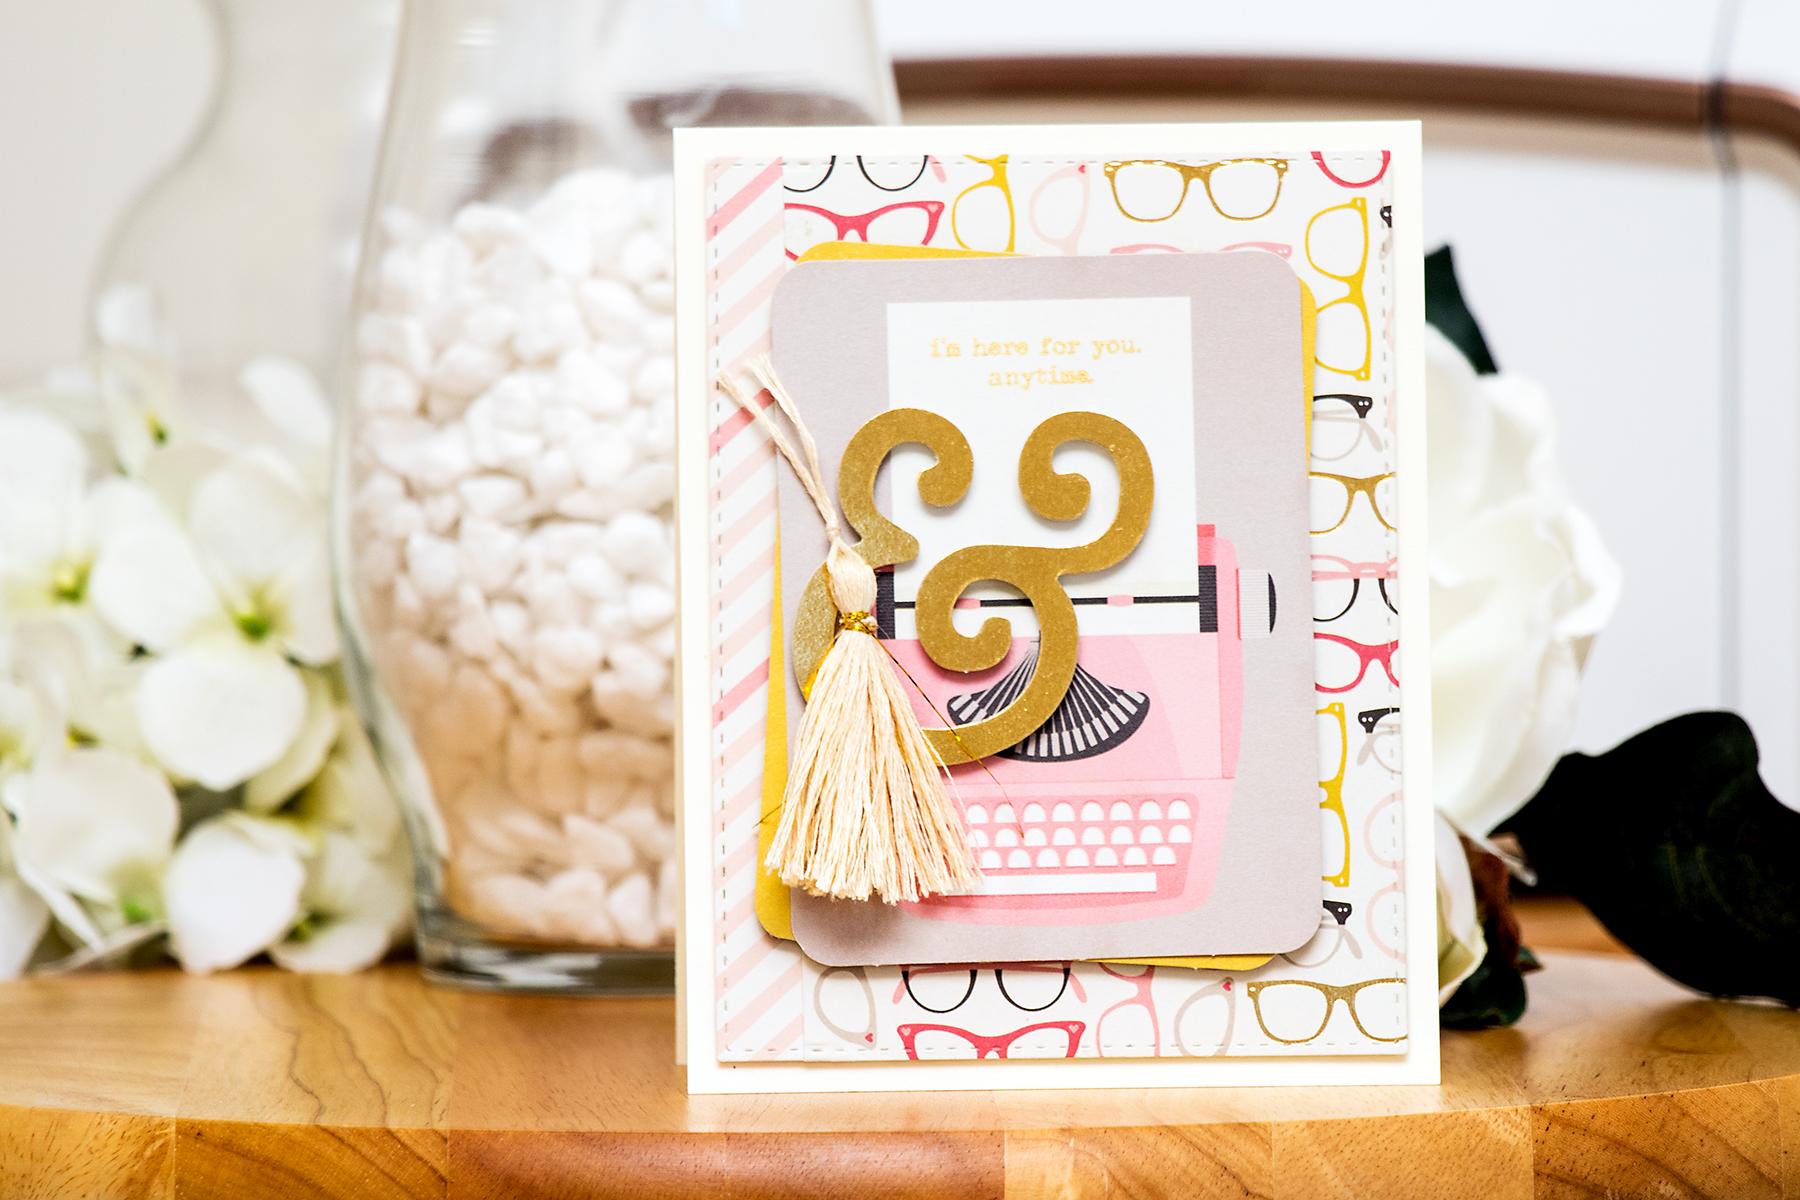 Yana Smakula | Simon Says Stamp October Card Kit - I'm Here For You Anytime